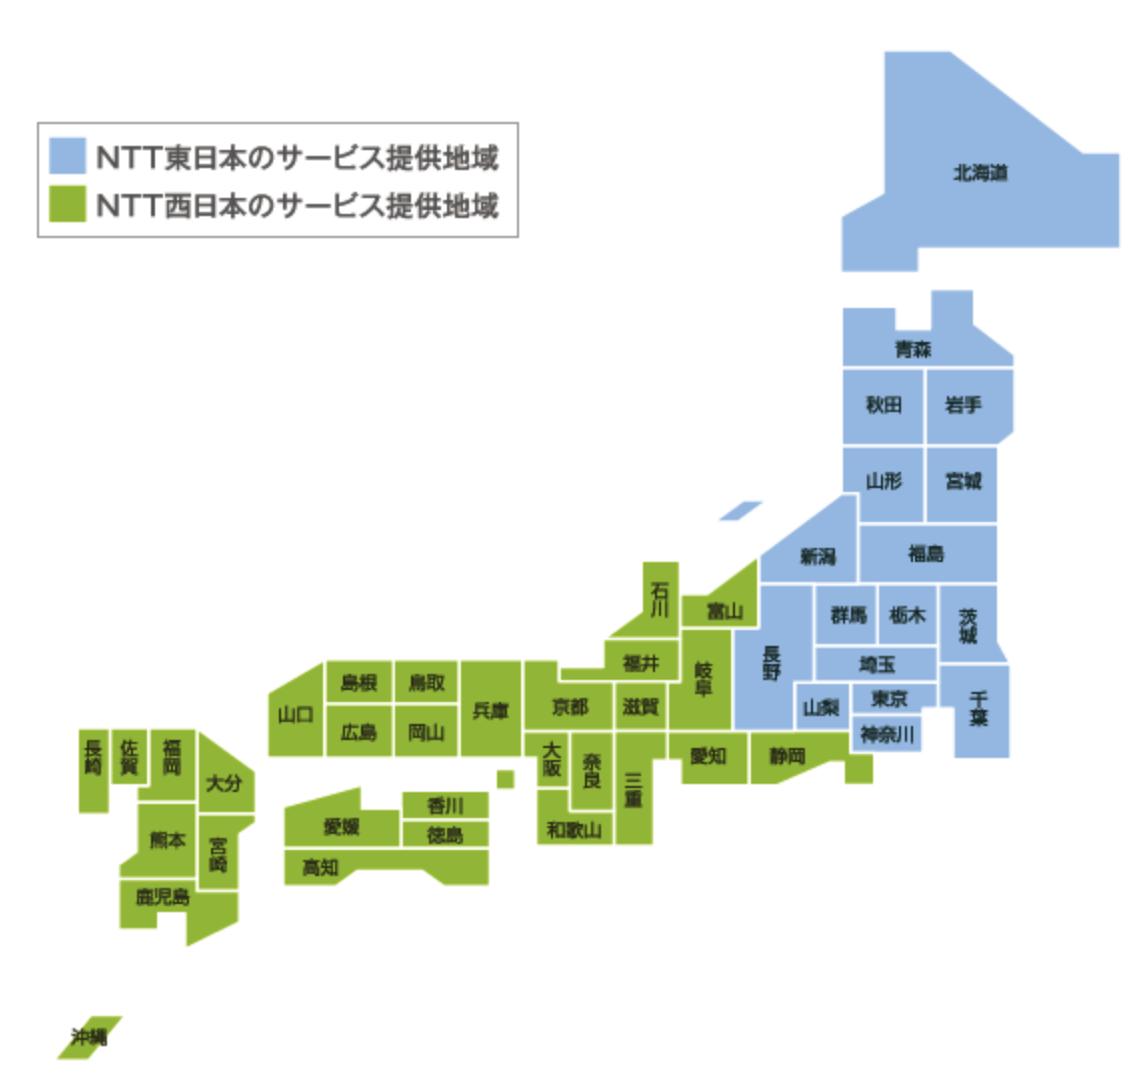 NTT東日本・西日本のエリアマップ